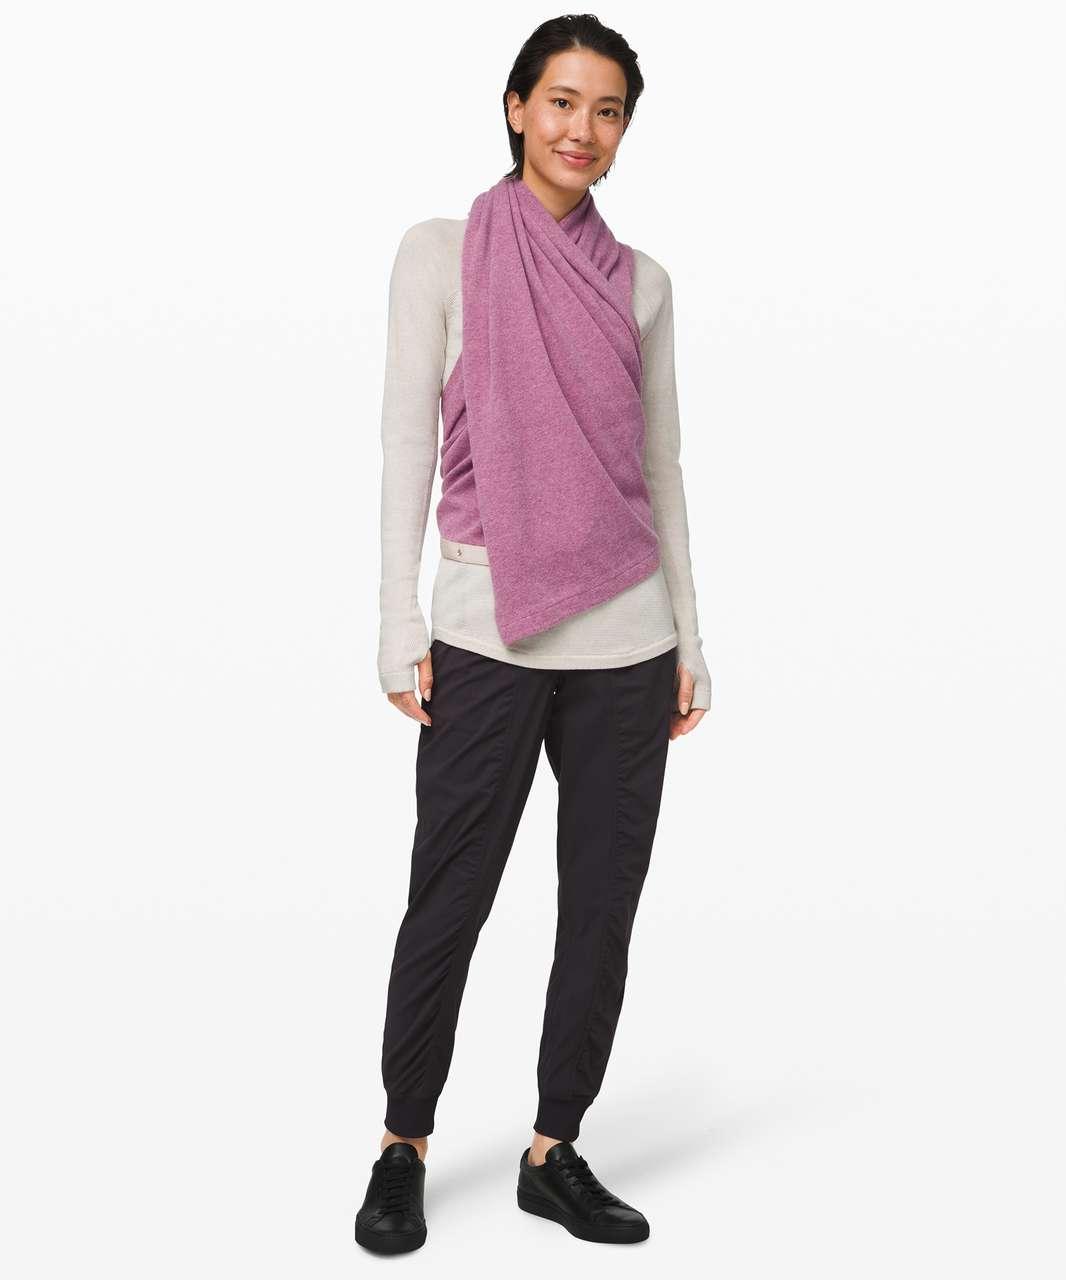 Lululemon Vinyasa Scarf *Cashmere - Pink Taupe